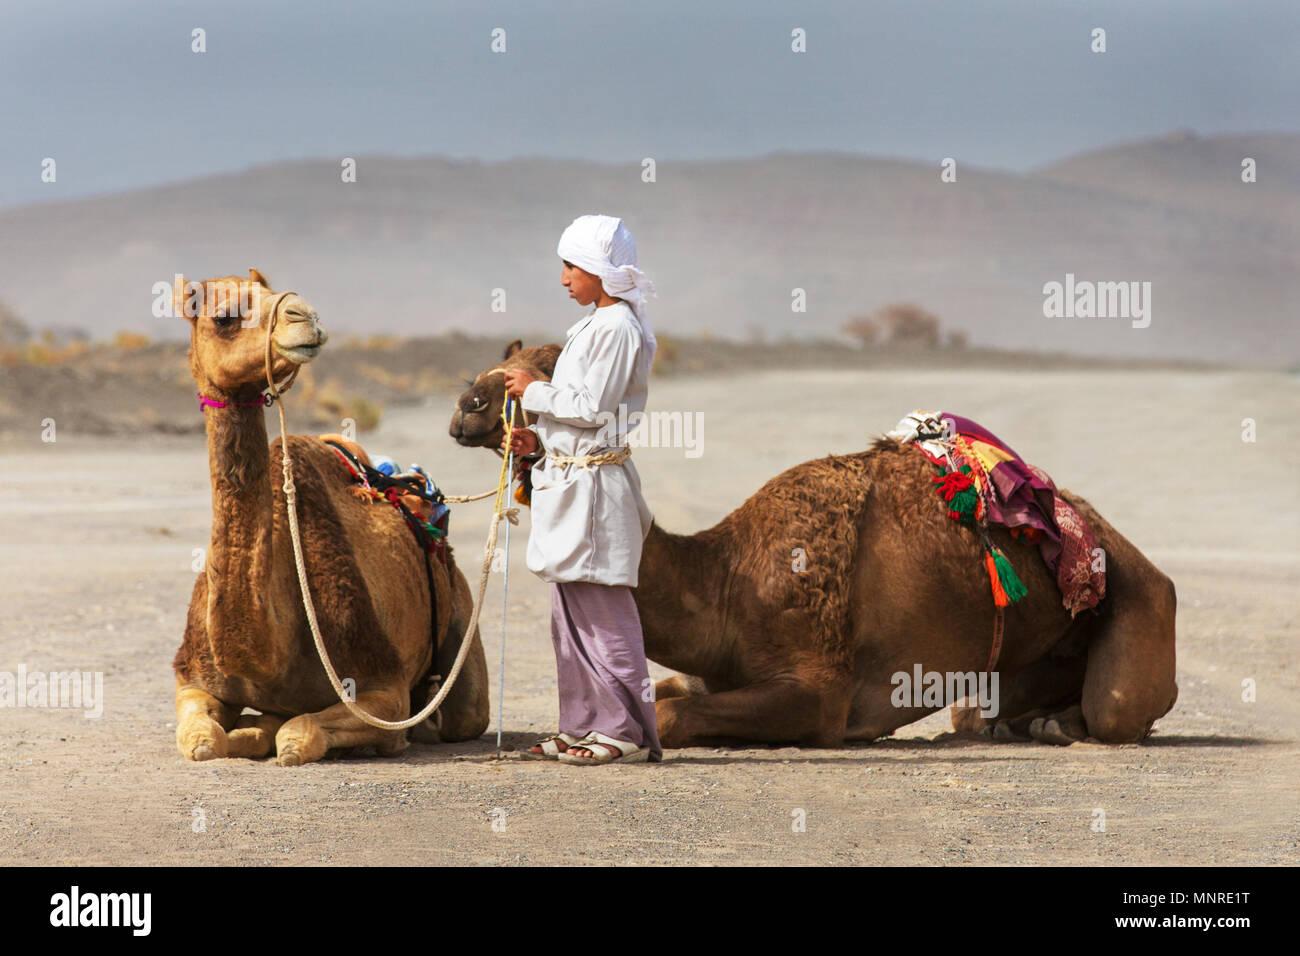 Fantastic Oman Eid Al-Fitr 2018 - al-safen-oman-27th-april-2018-bedouin-boy-with-his-camels-in-omani-countryside-MNRE1T  Pic_272640 .jpg